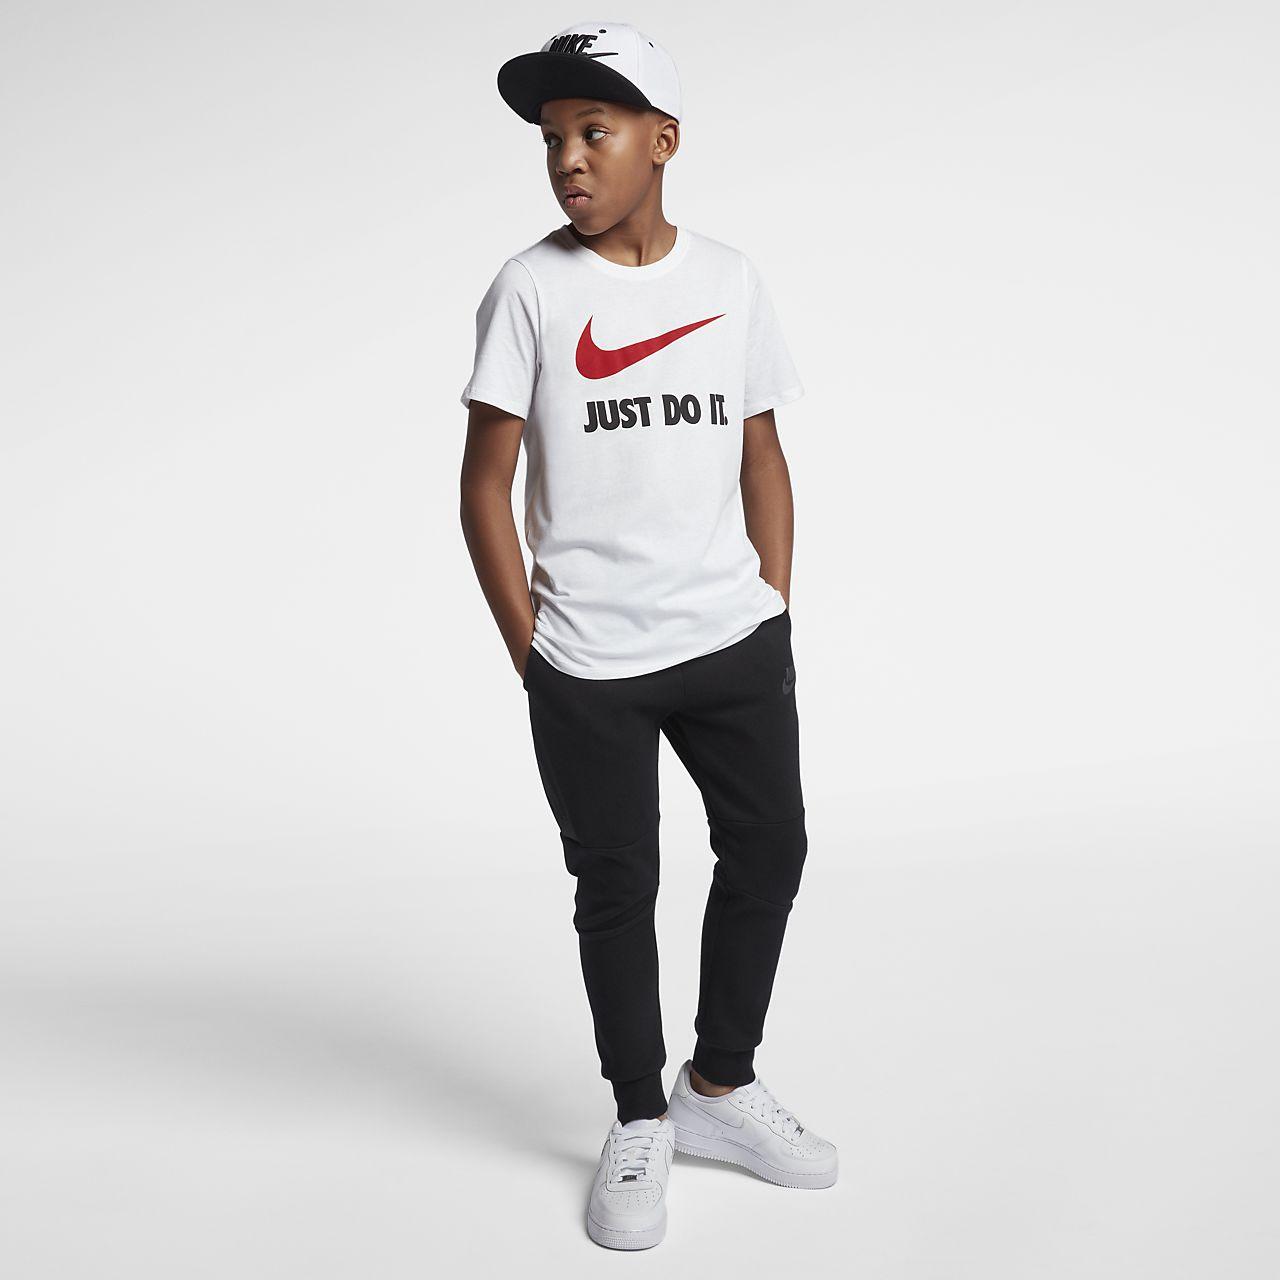 8917835d83359 Nike Just Do It Swoosh Older Kids  (Boys ) T-Shirt. Nike.com ZA